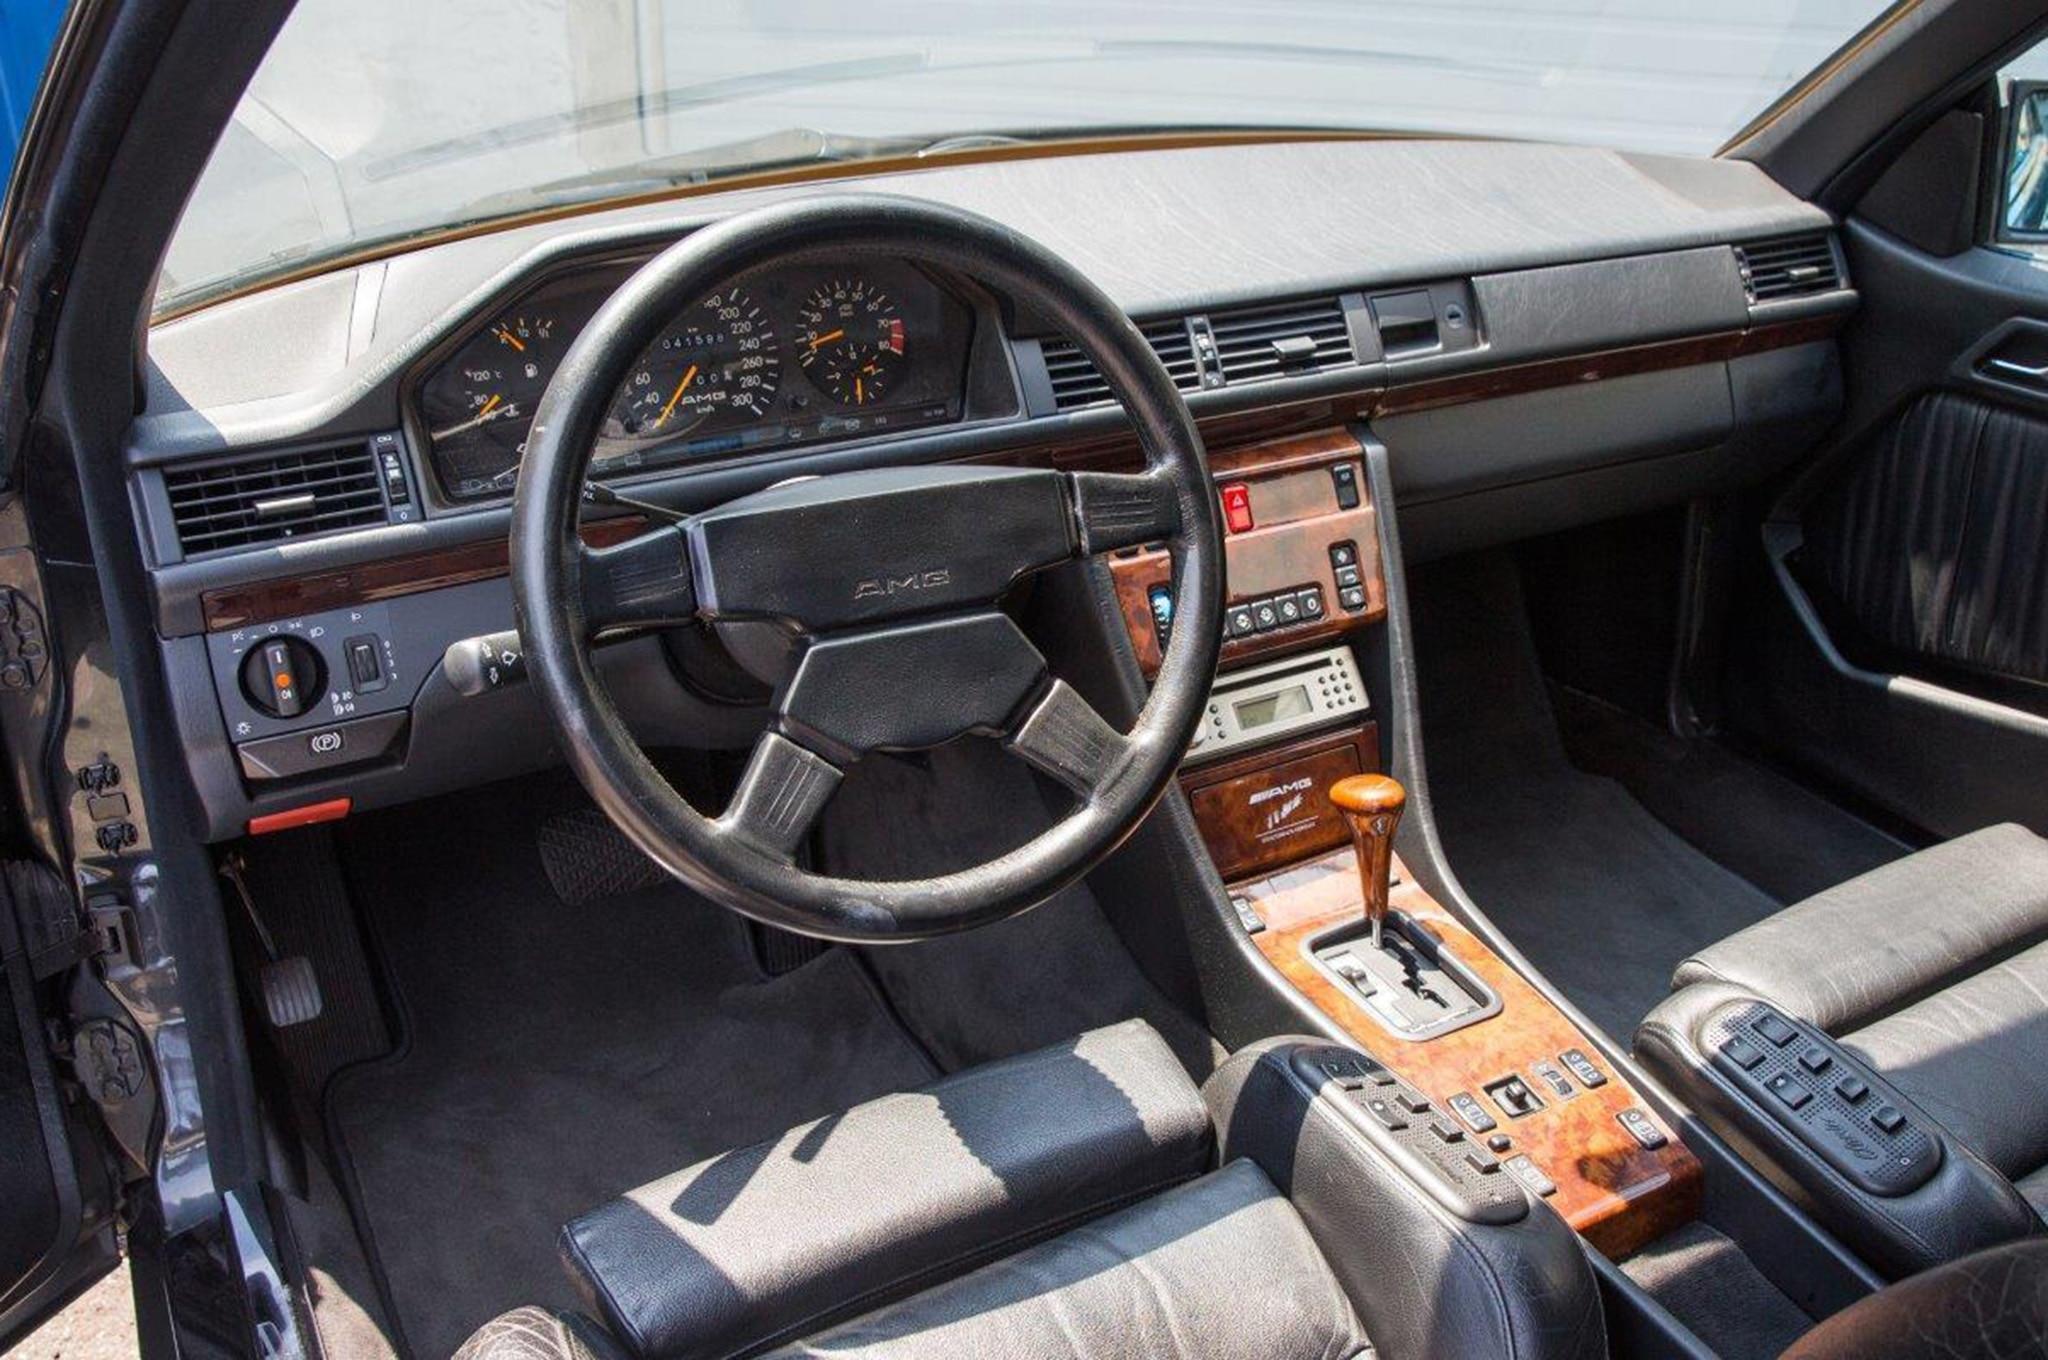 Rare 1990 MercedesBenz 300CE 34 AMG Up for Sale on eBay